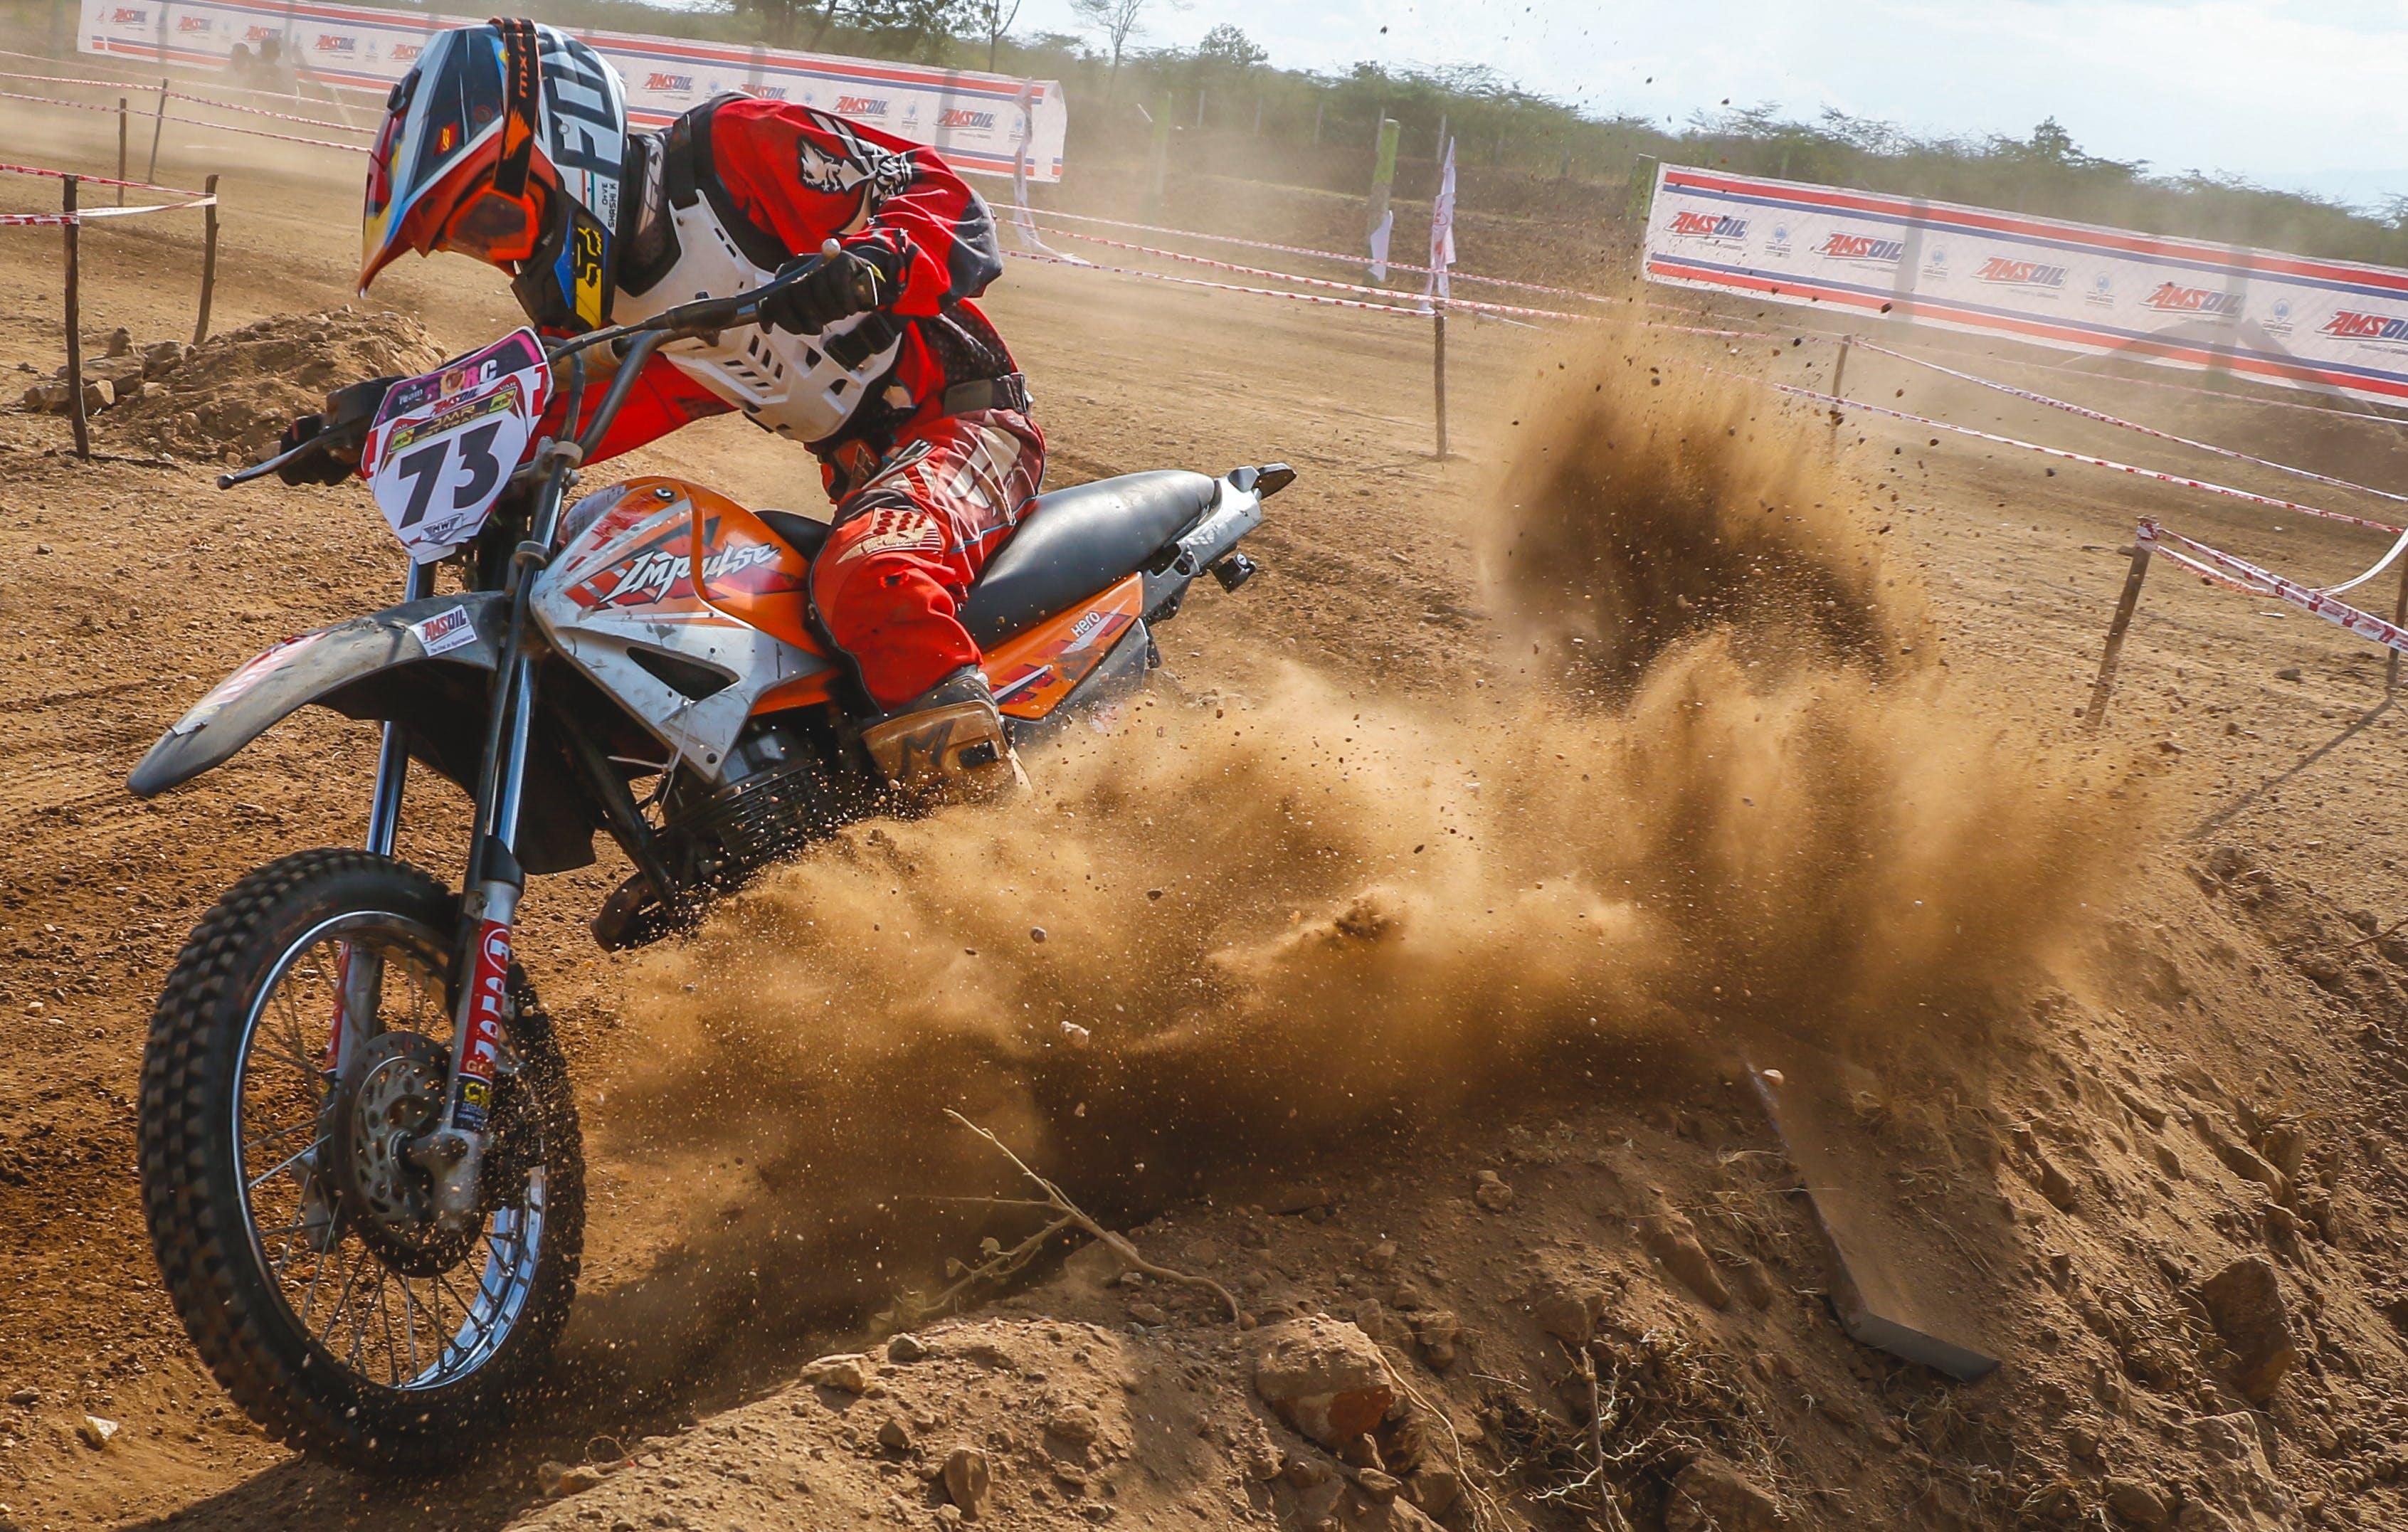 Man Riding Motocross Dirt Bike on Dirt Road